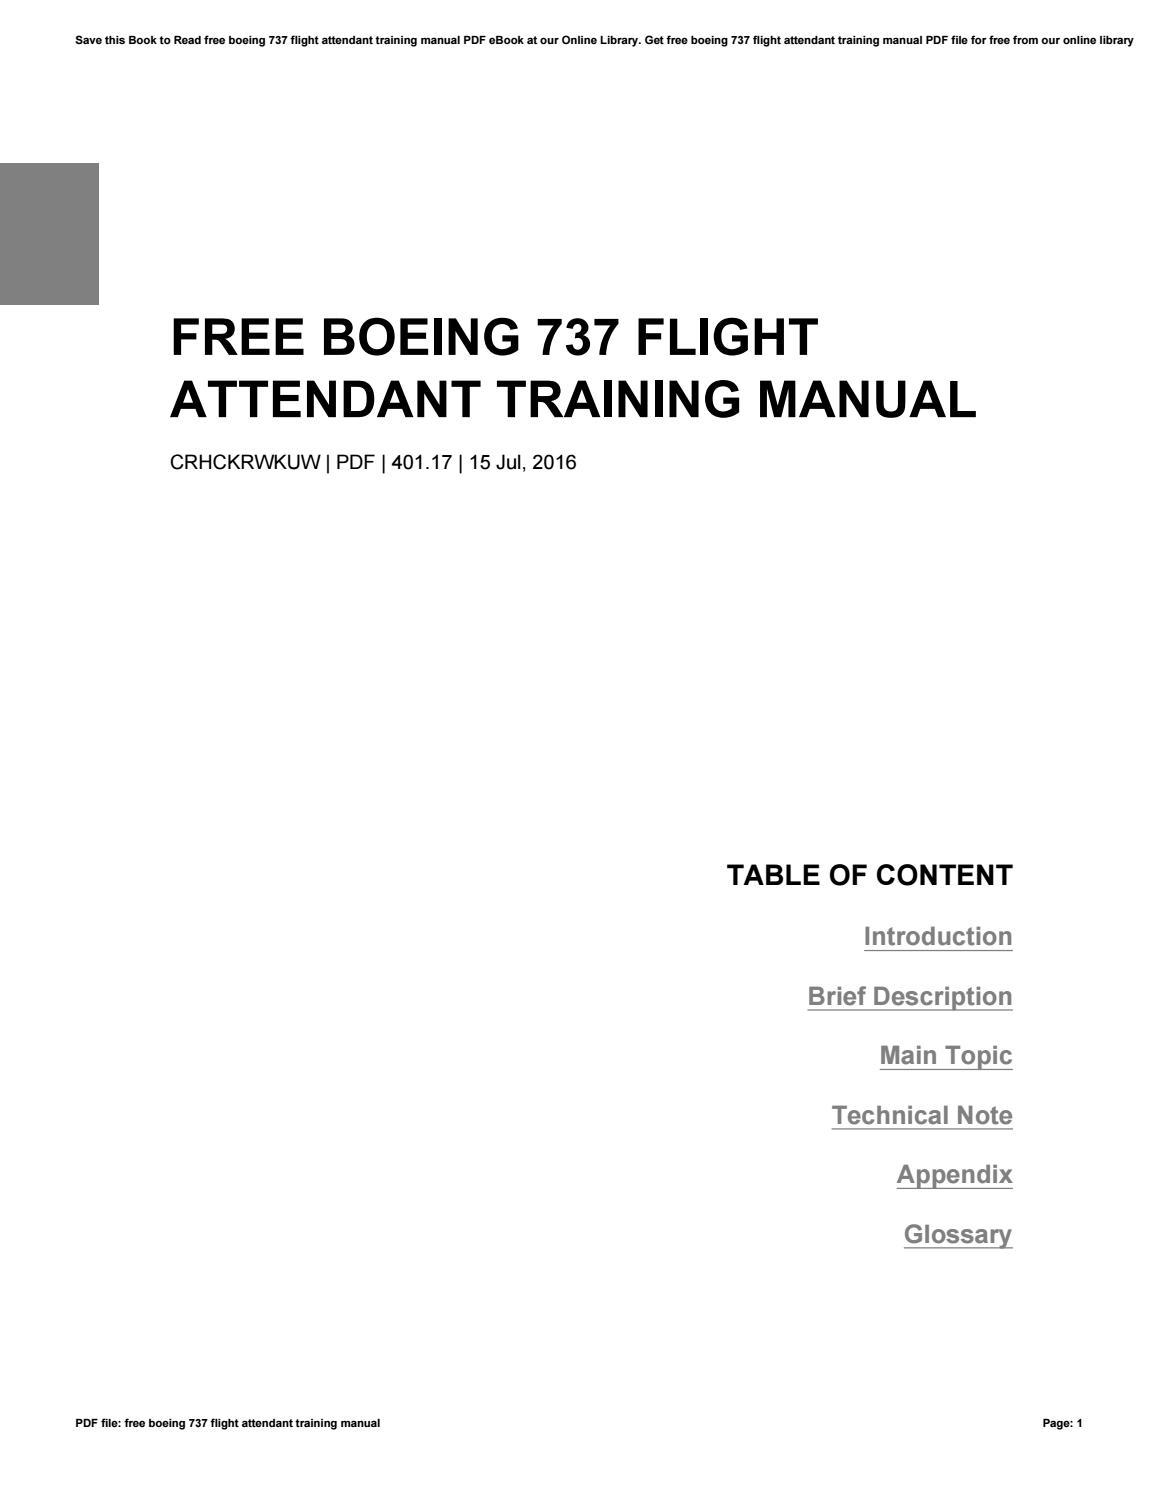 Free boeing 737 flight attendant training manual by Bridget Blaine - issuu